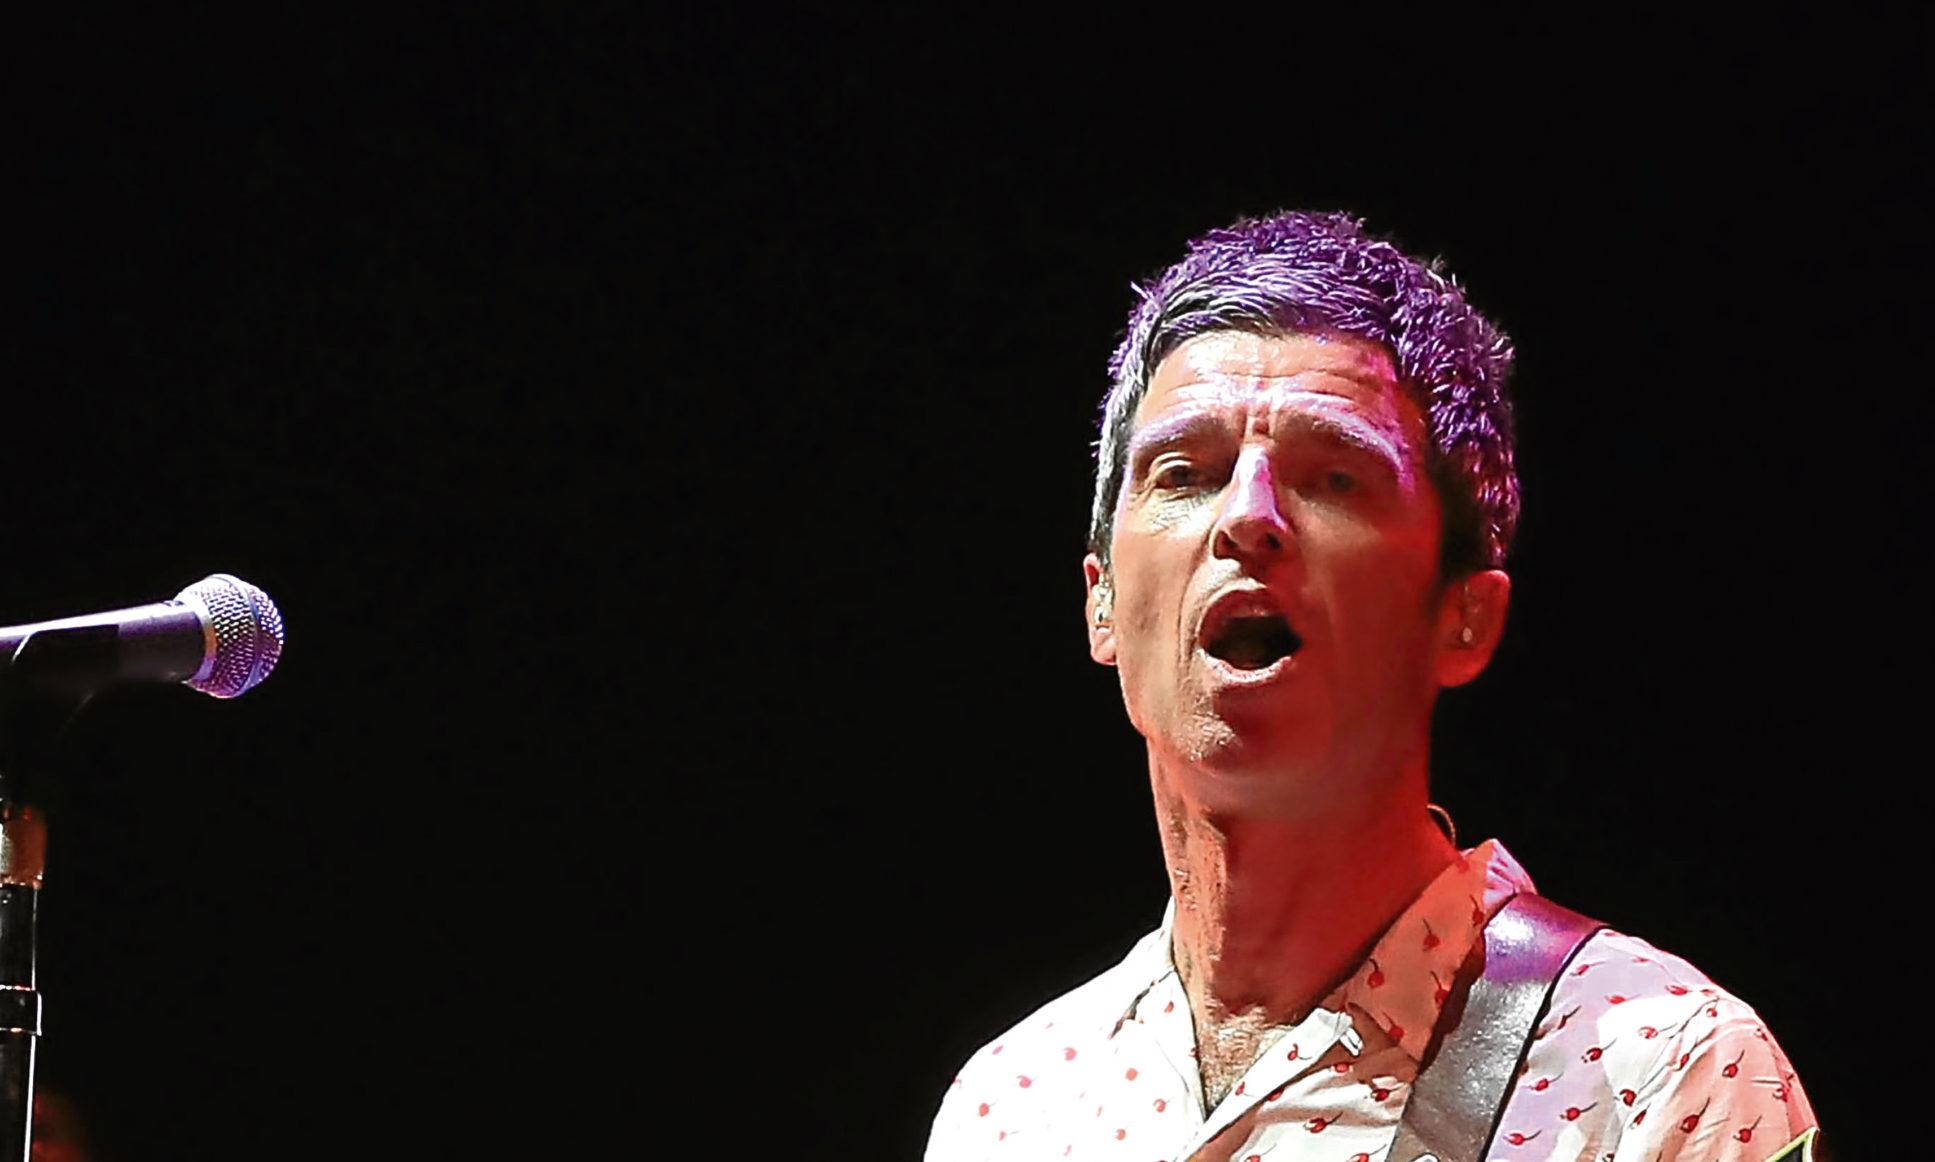 Noel Gallagher will make a headline appearance